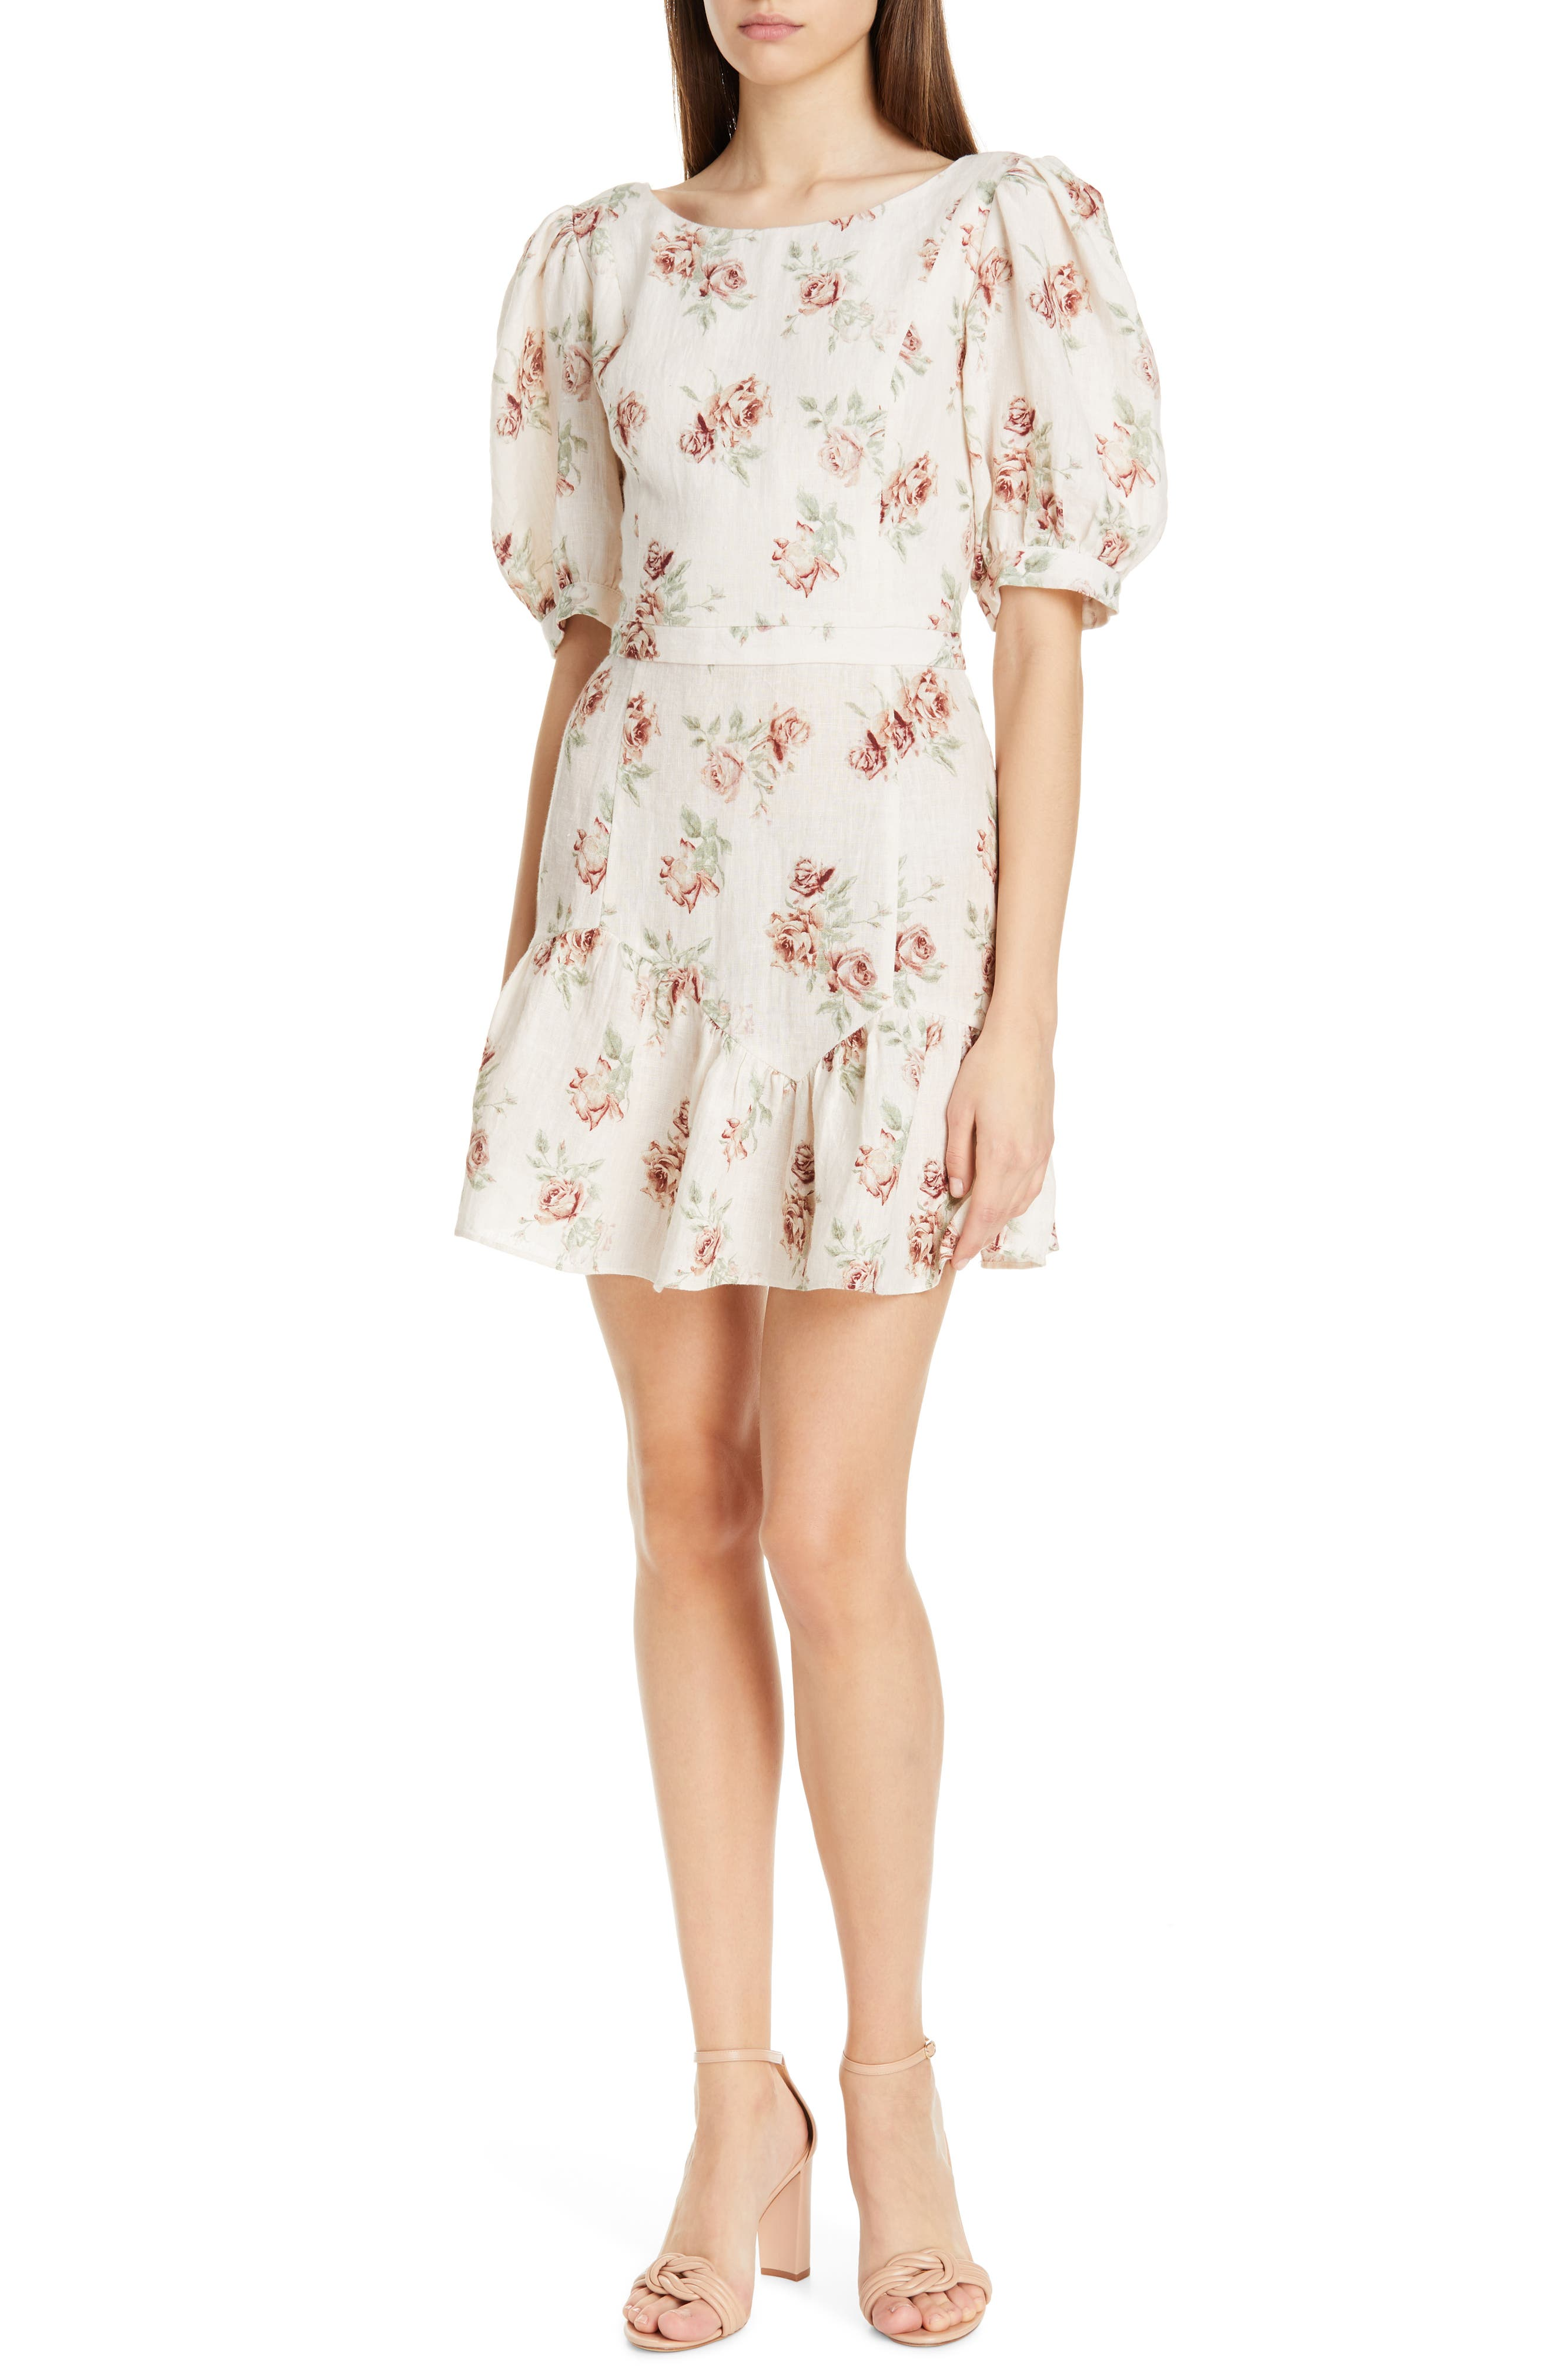 Loveshackfancy Lena Linen Dress, Ivory